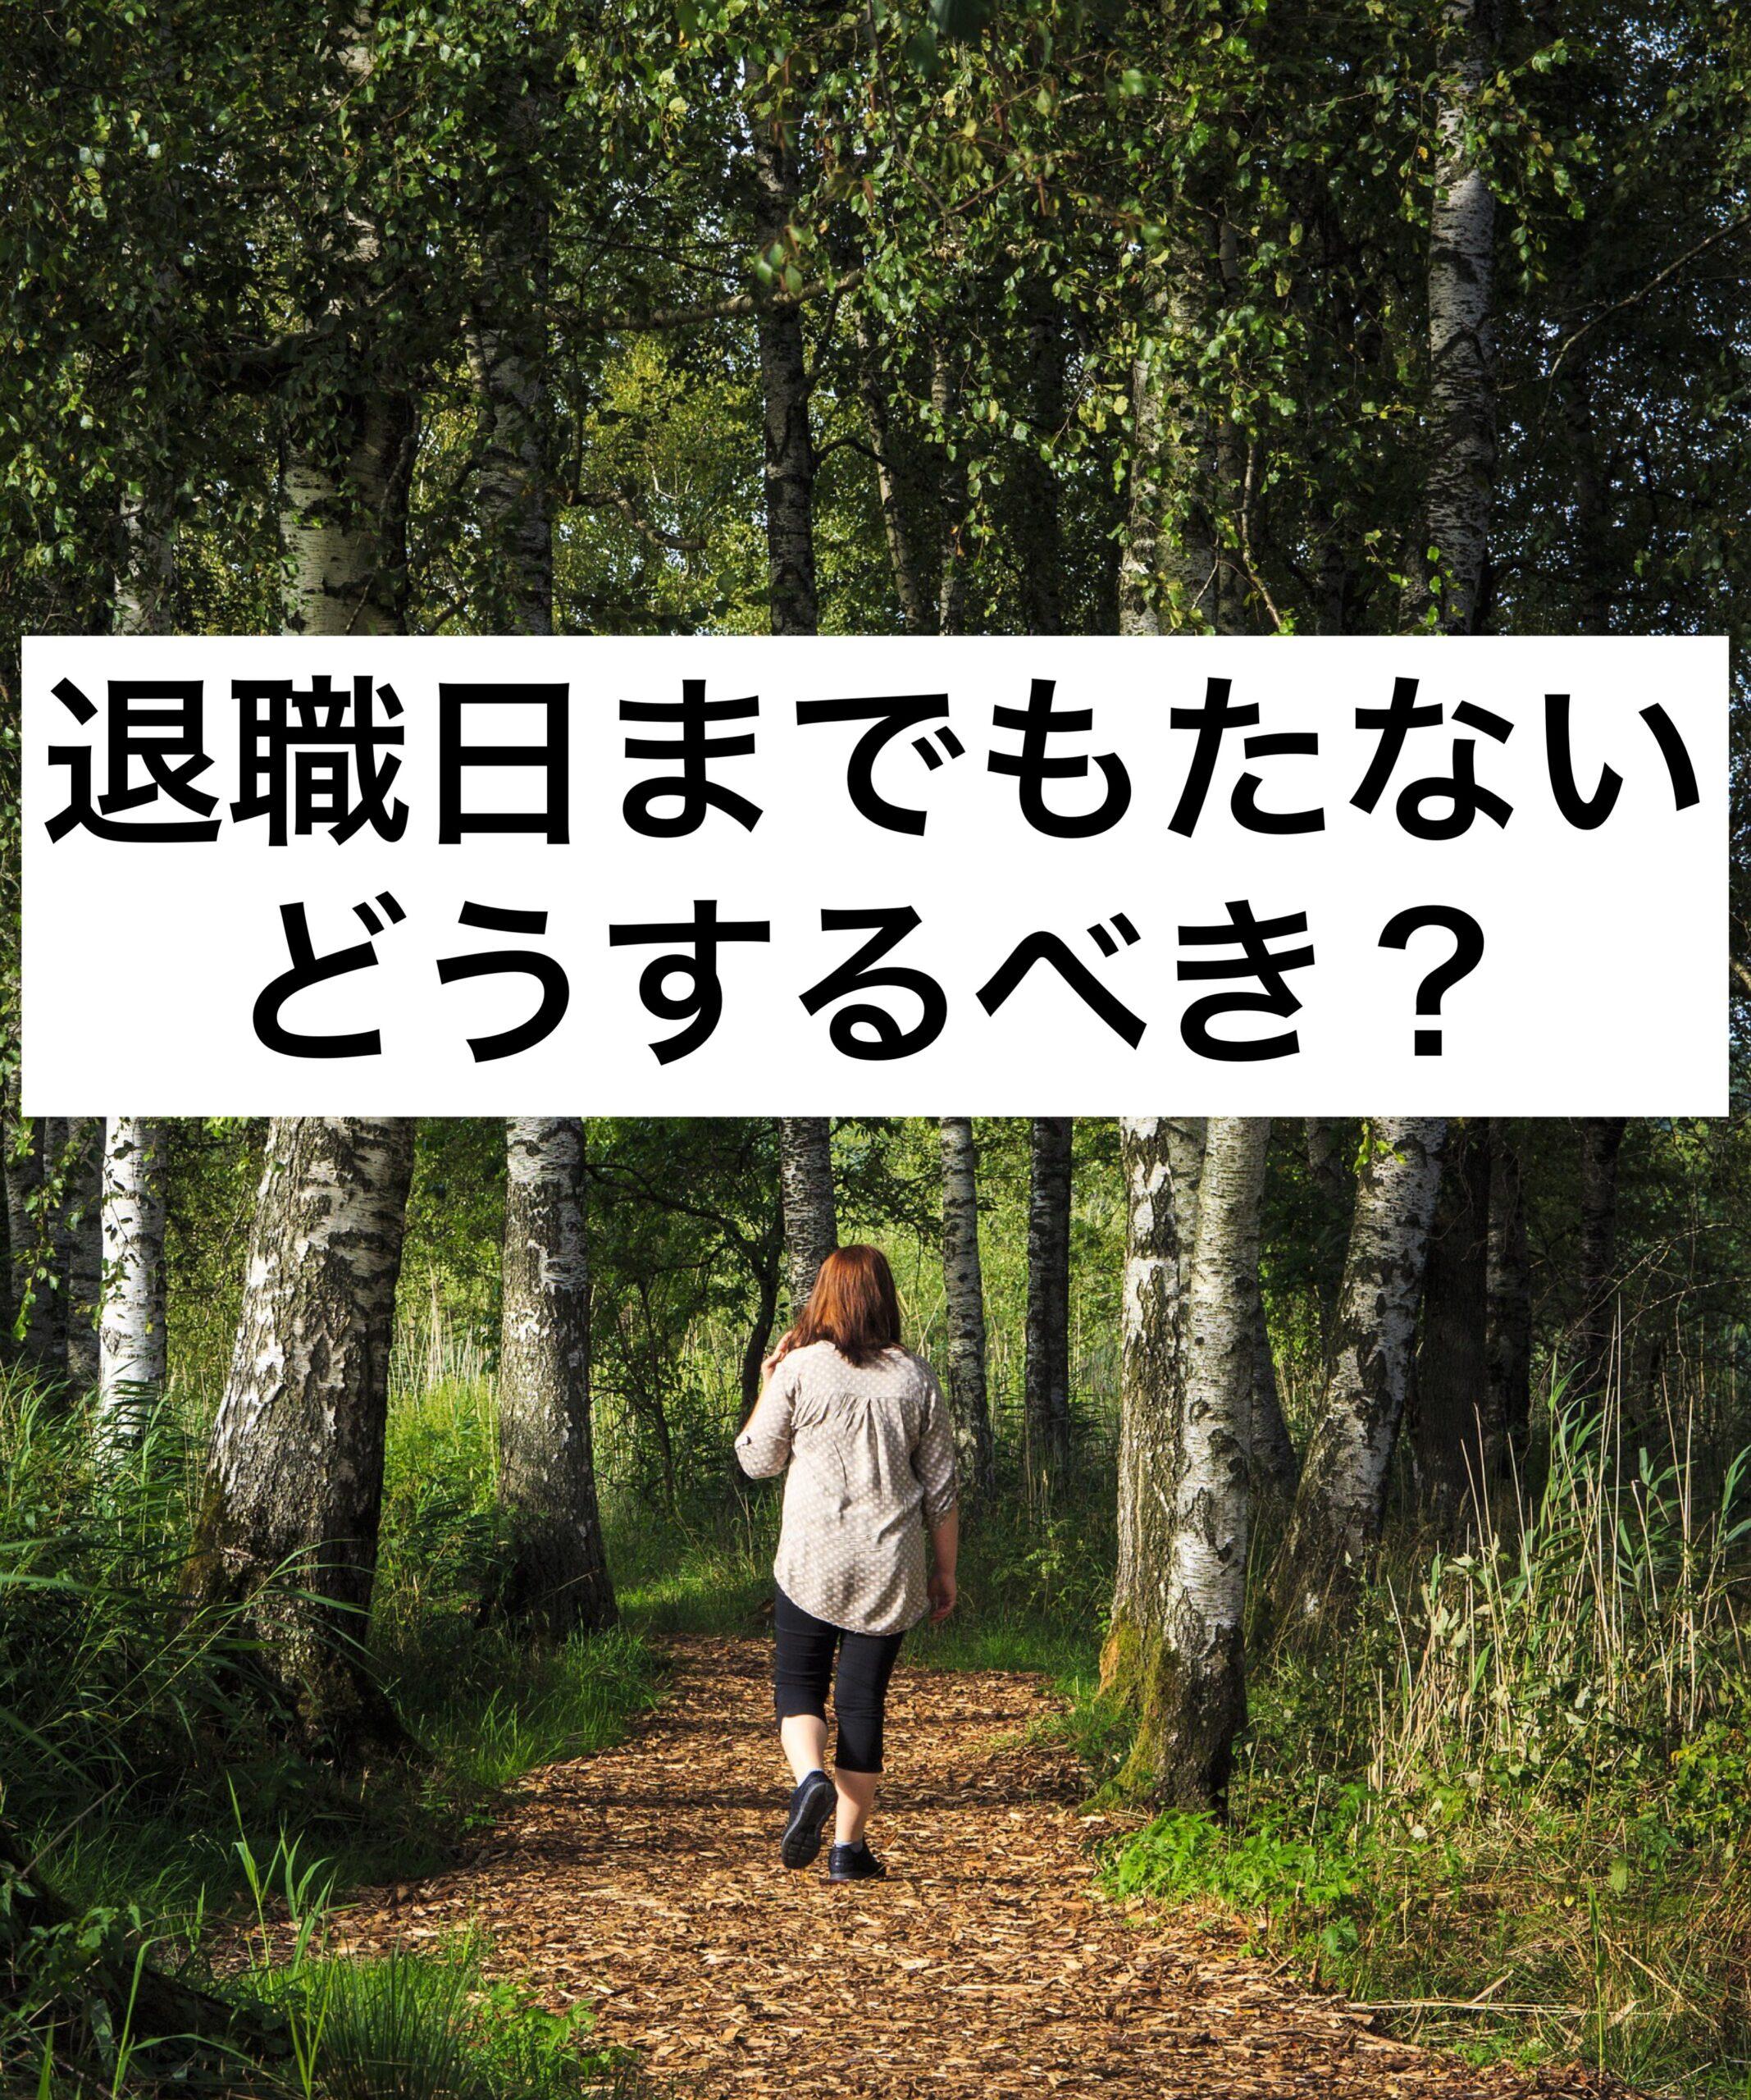 taisyokubimade-motanai